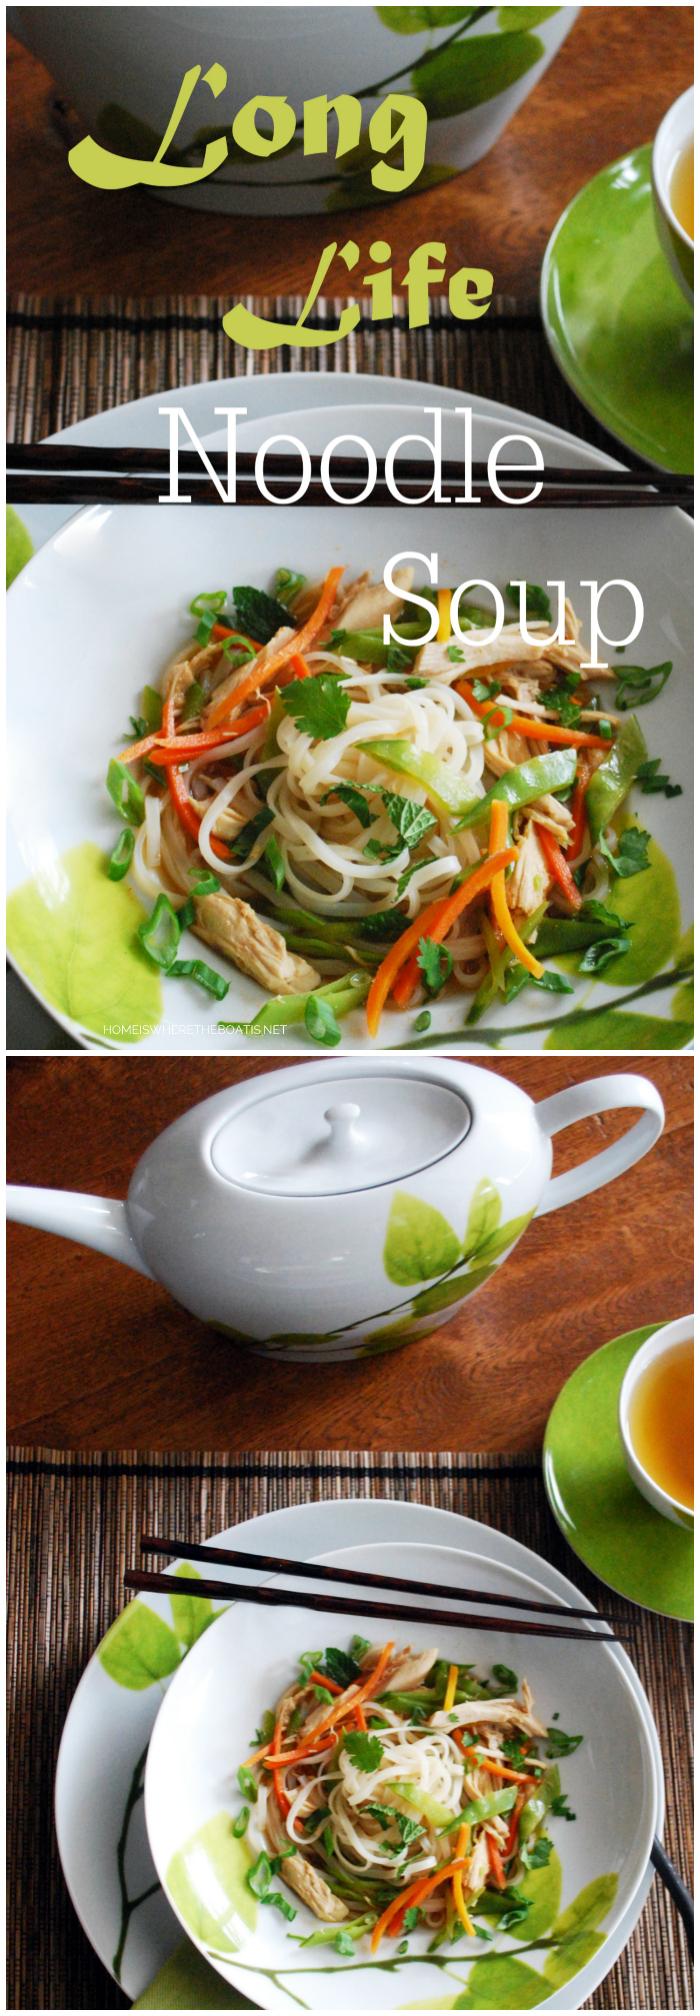 Long Life Noodle Soup | ©homeiswheretheboatis.net